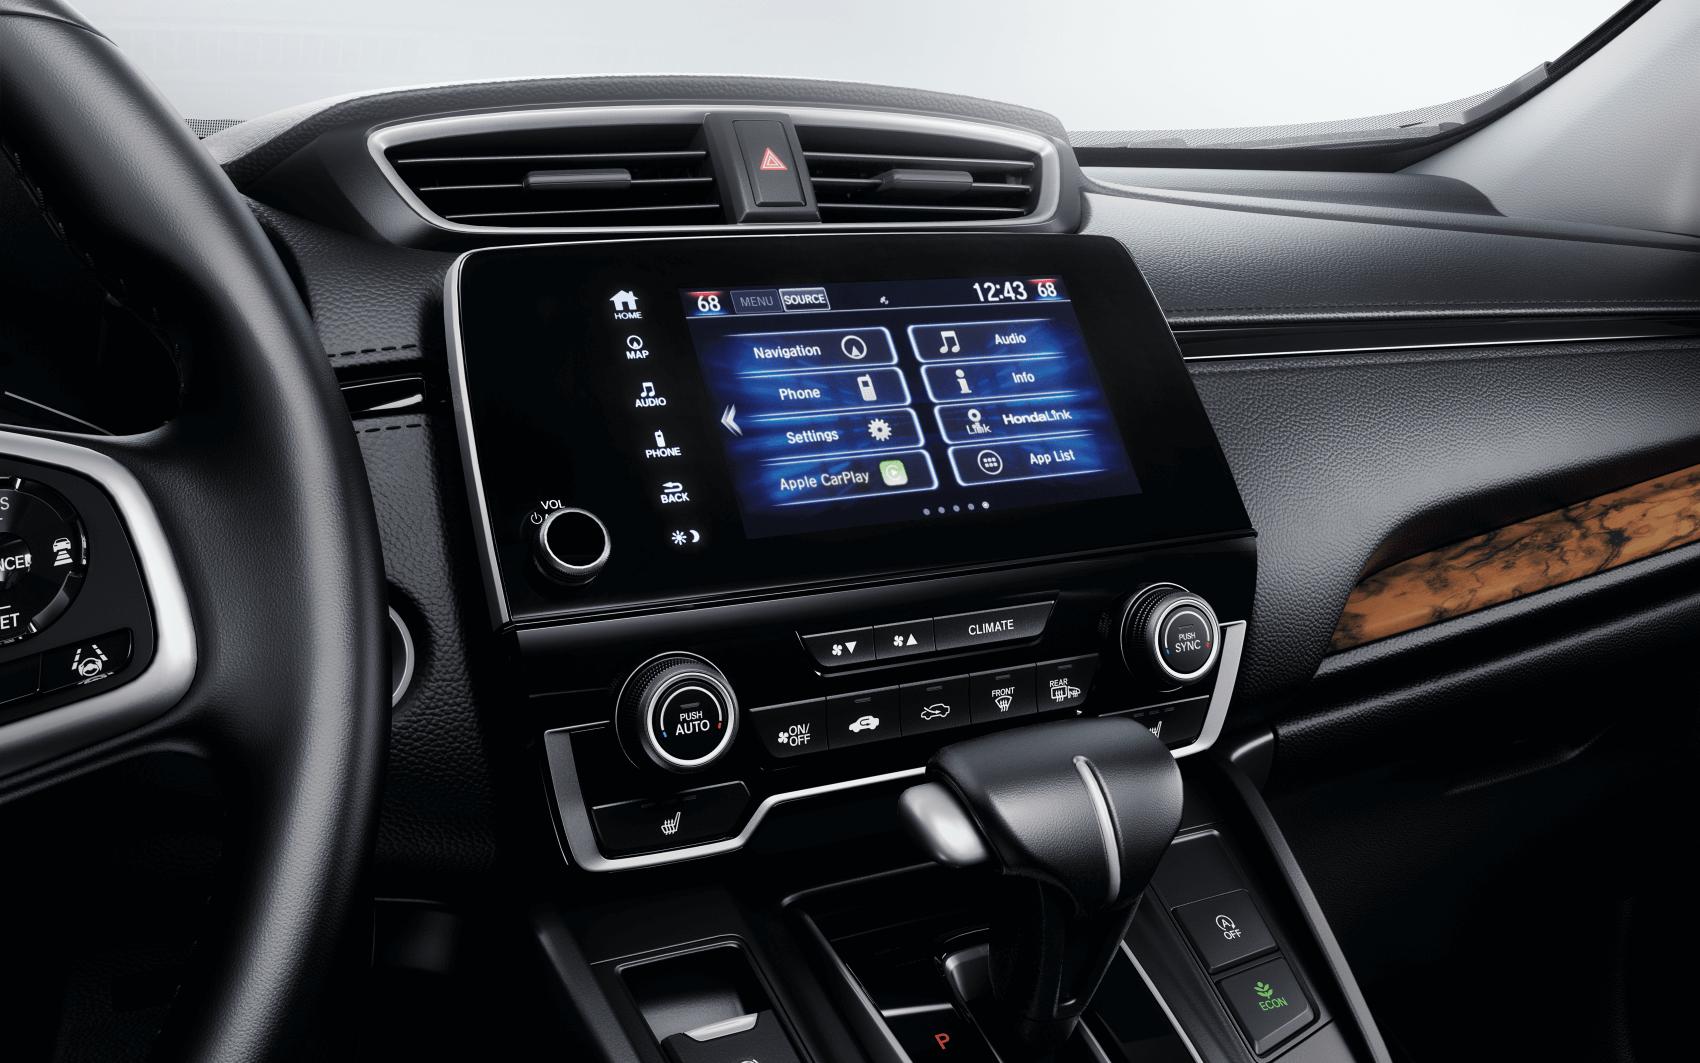 Honda CR-V Interior Dashboard Tech